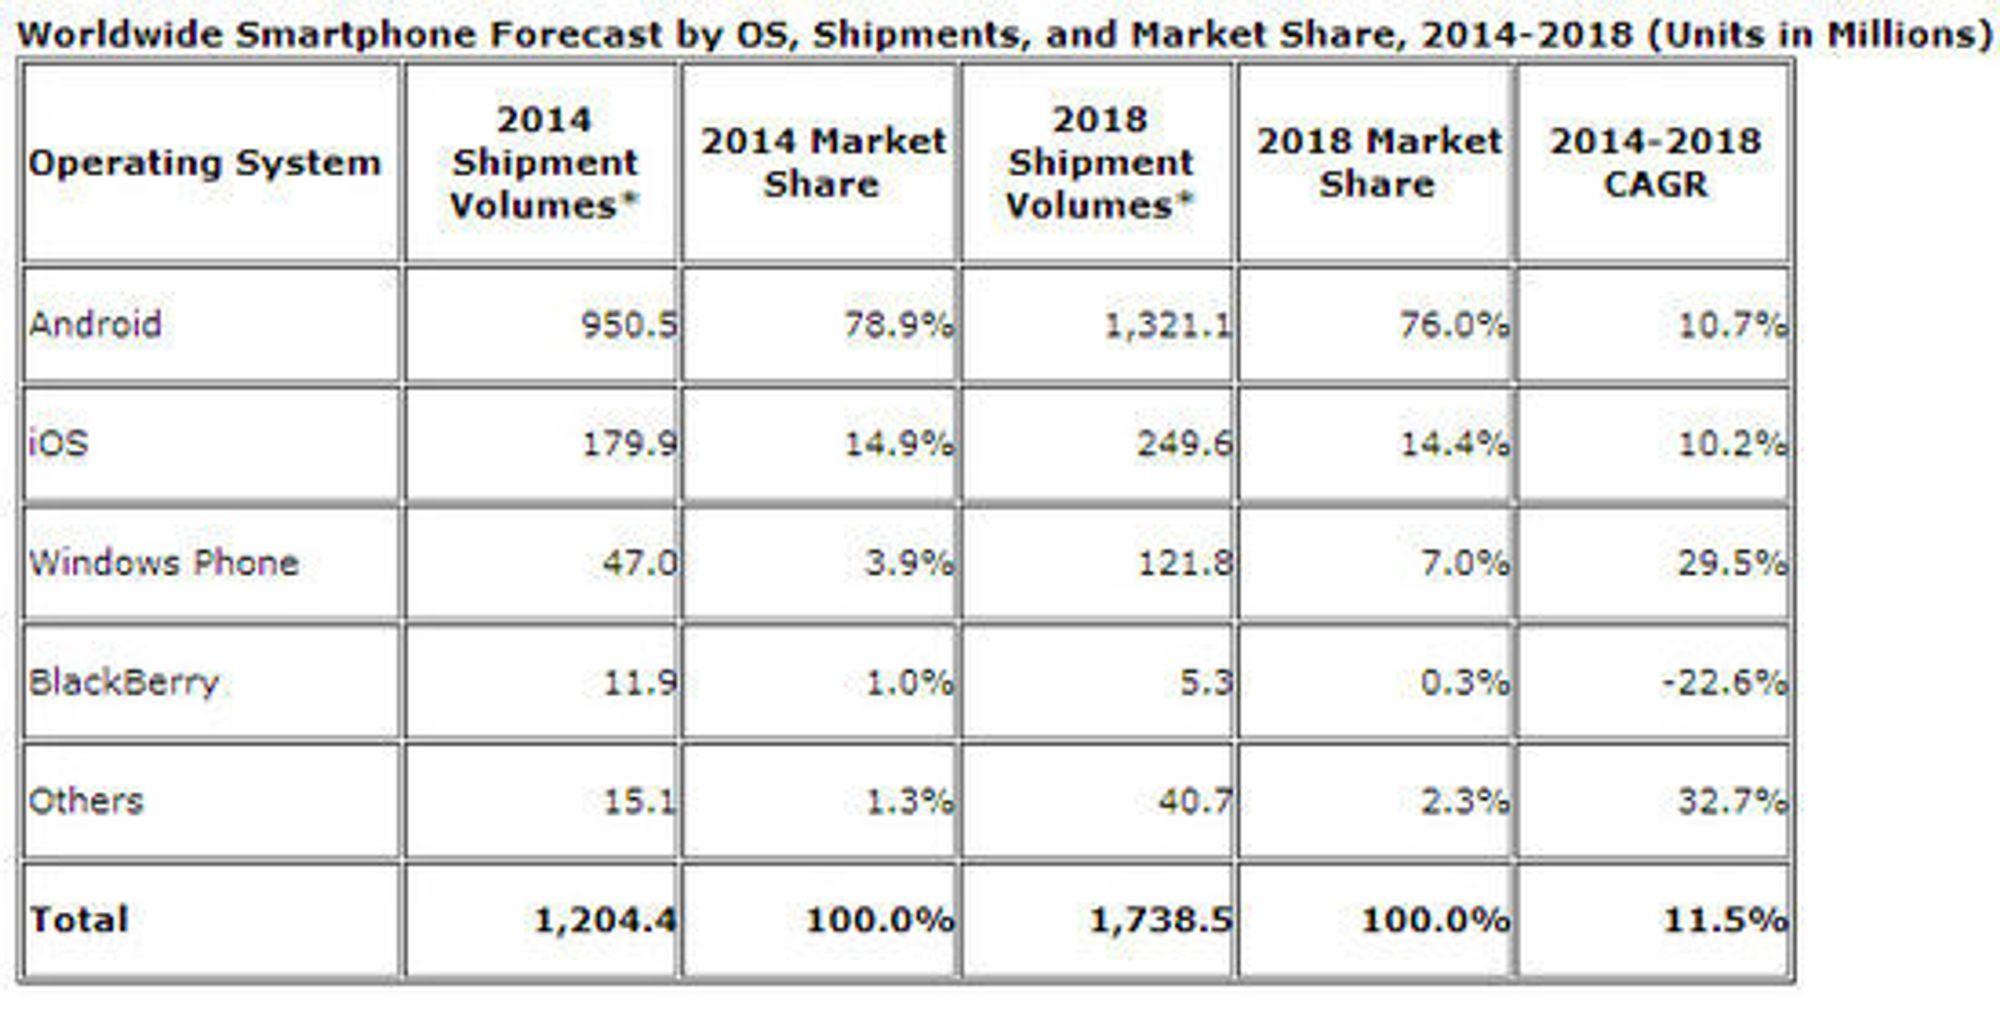 IDCs prognose om plattformandelen i smartmobilmarkedet i 2014 og 2018.